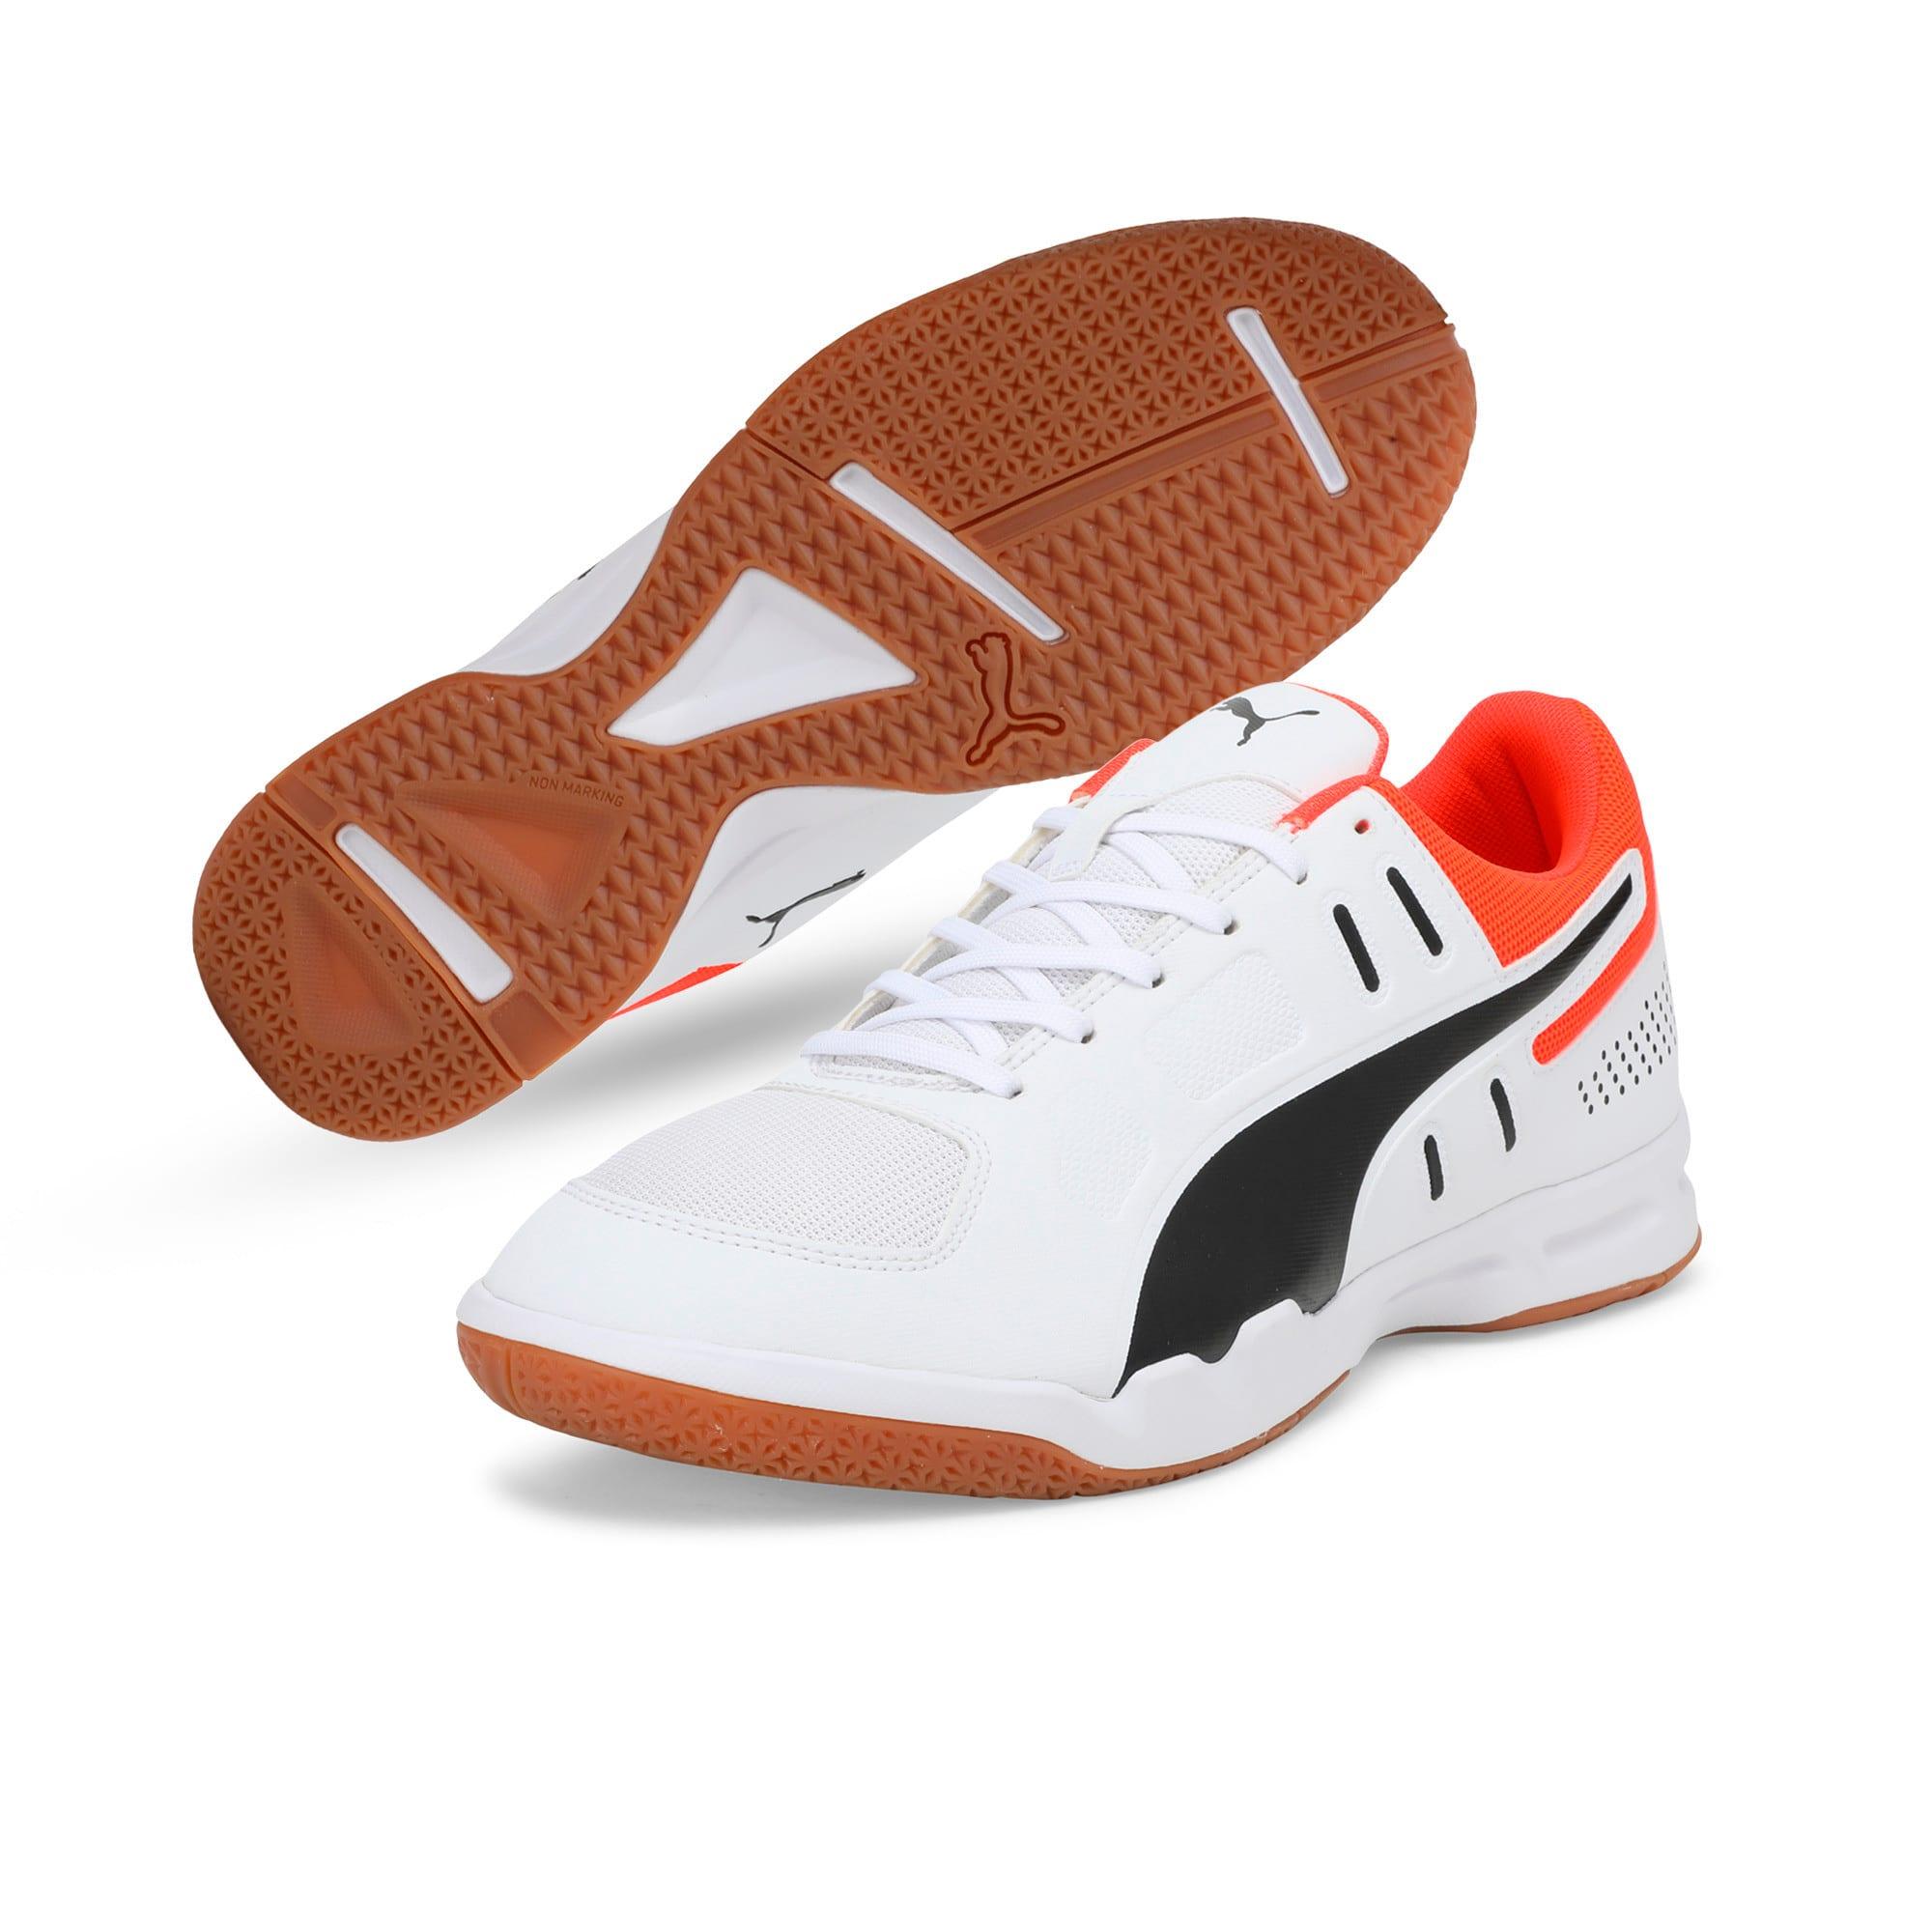 Thumbnail 4 of Auriz Indoor Sport Men's Trainers, White-Black-Nrgy Red-Gum, medium-IND